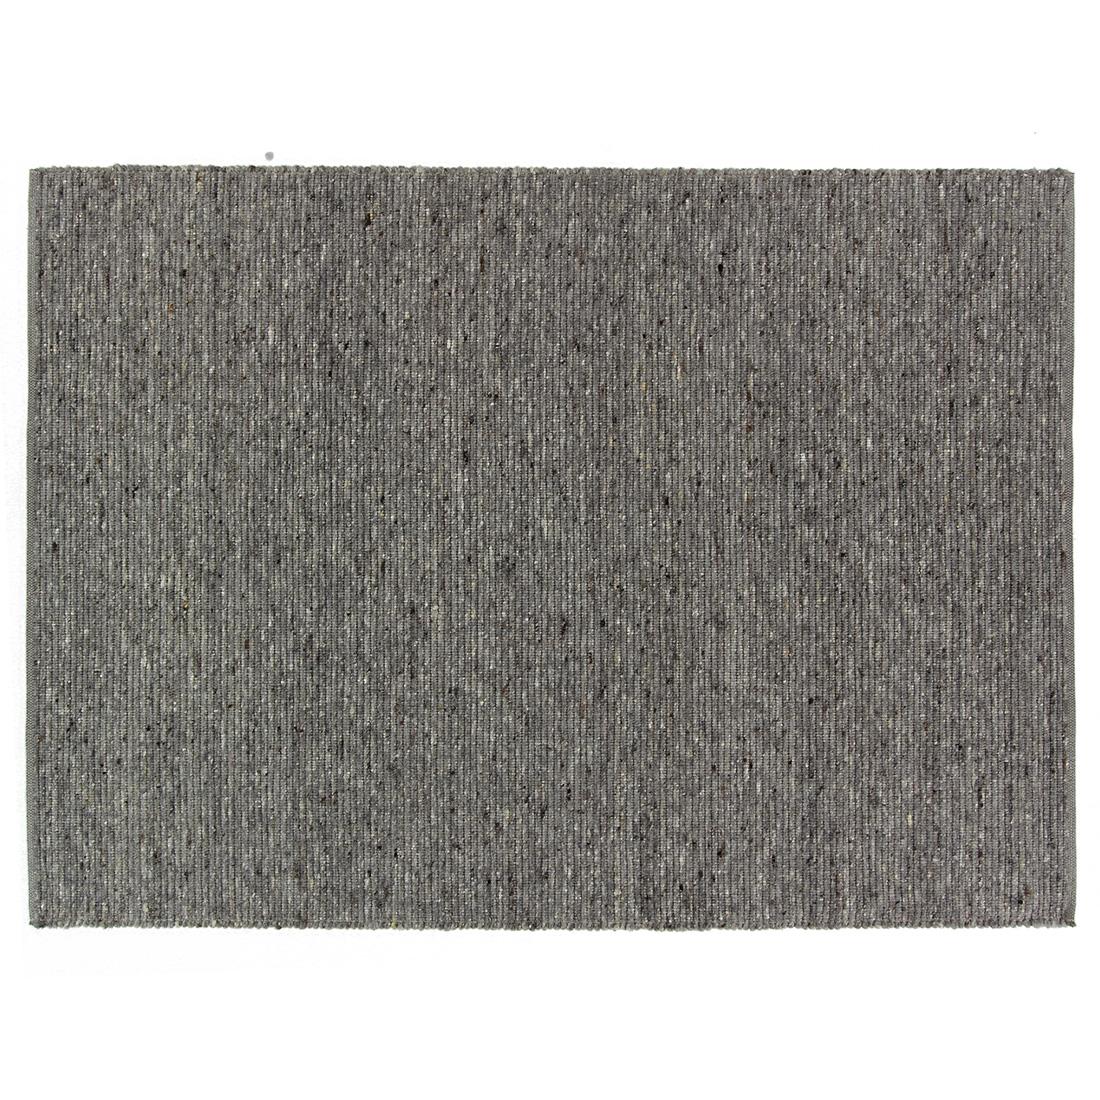 Vloerkleed Brinker Alta 228 | 200 x 300 cm